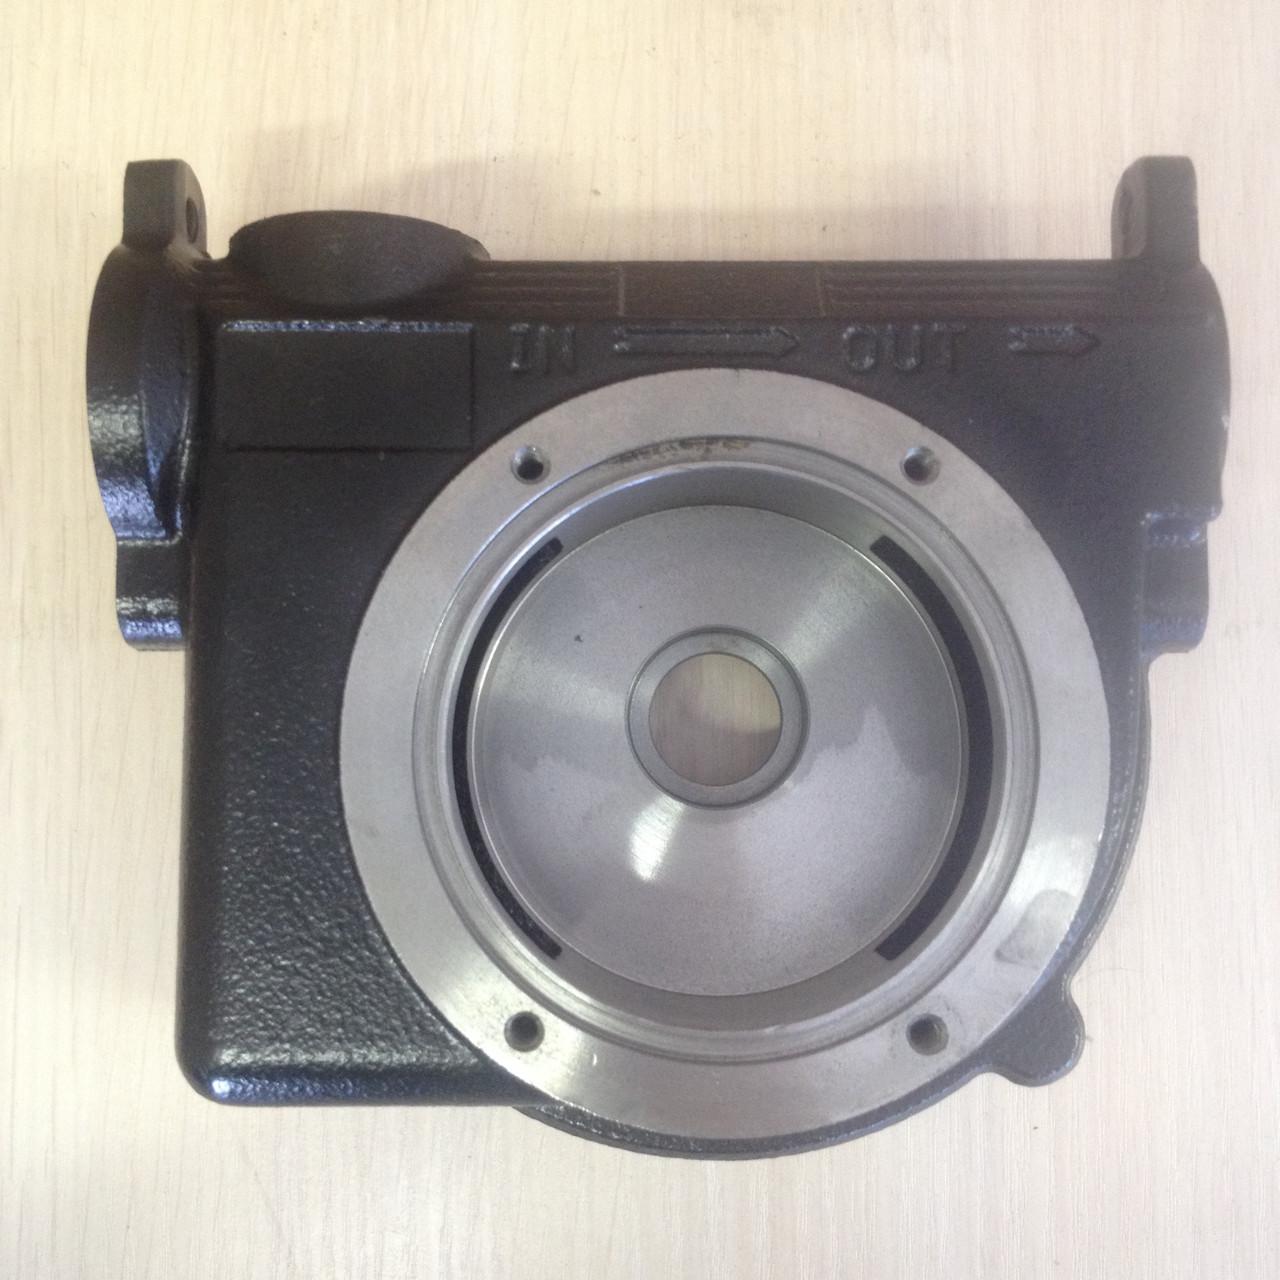 Корпус помпы PA-2 100 (Adam pumps)